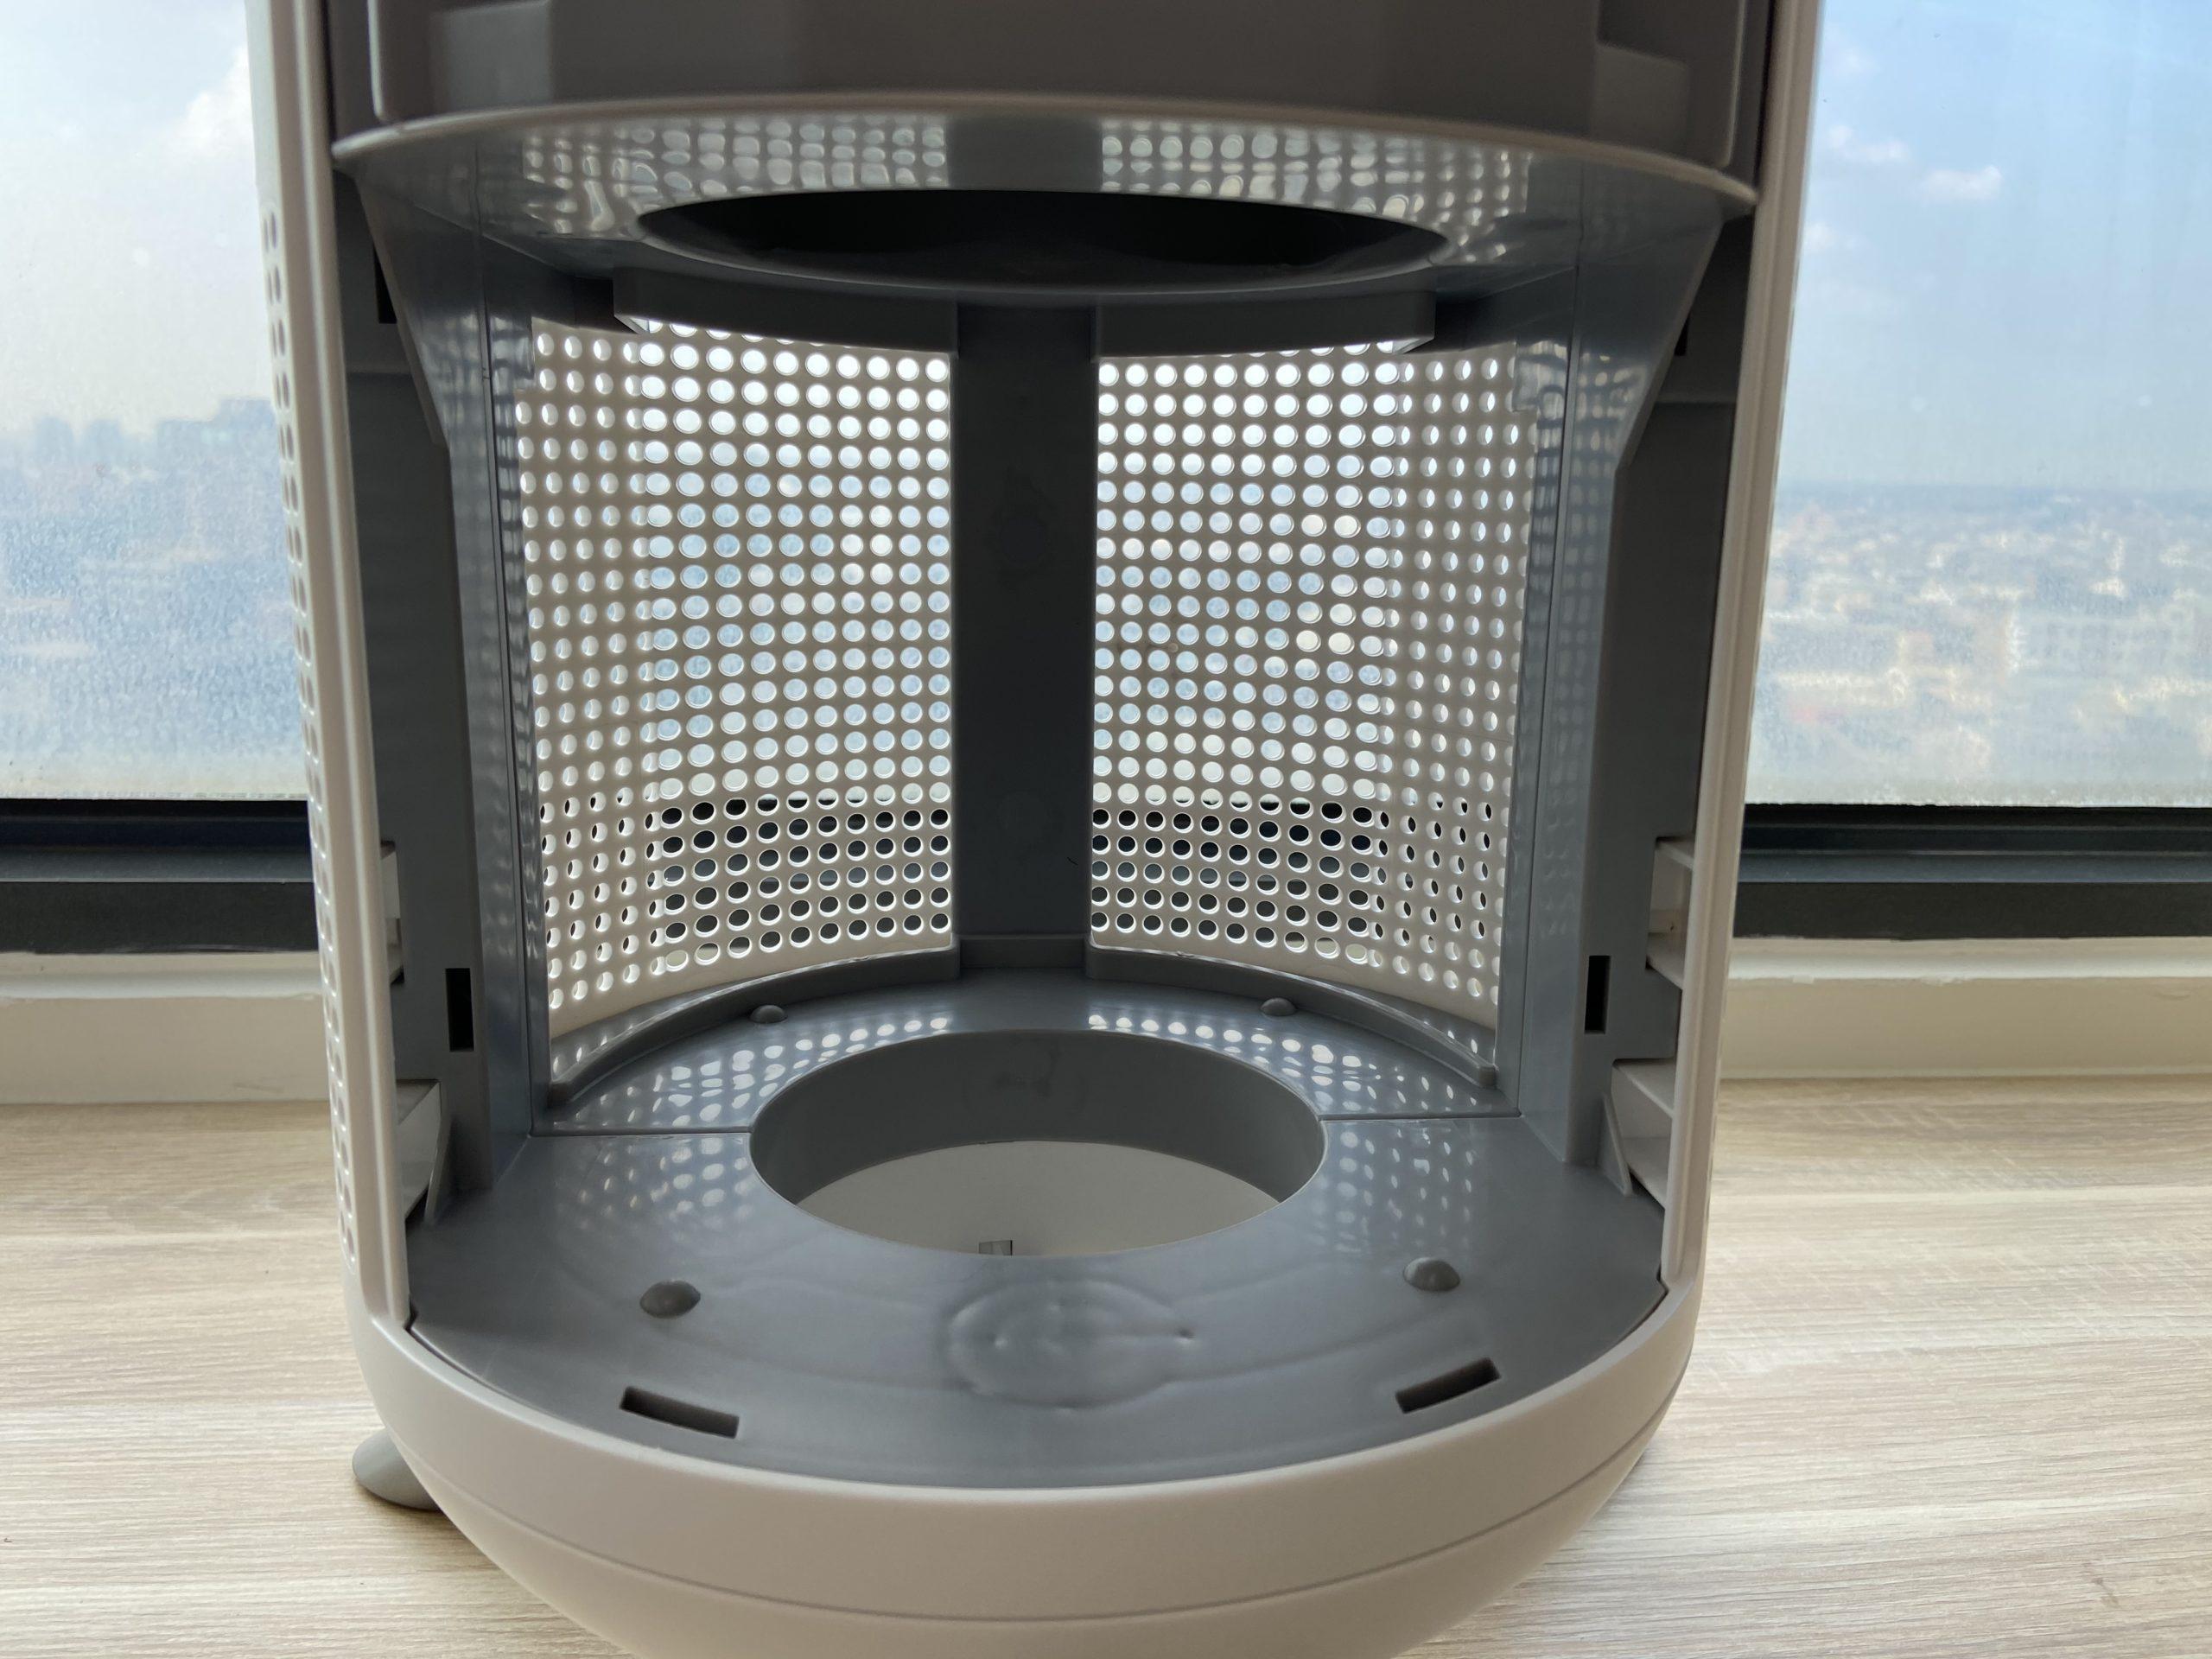 Honeywell HPA 830 淨香氛空氣清淨機 內部參觀 圖1